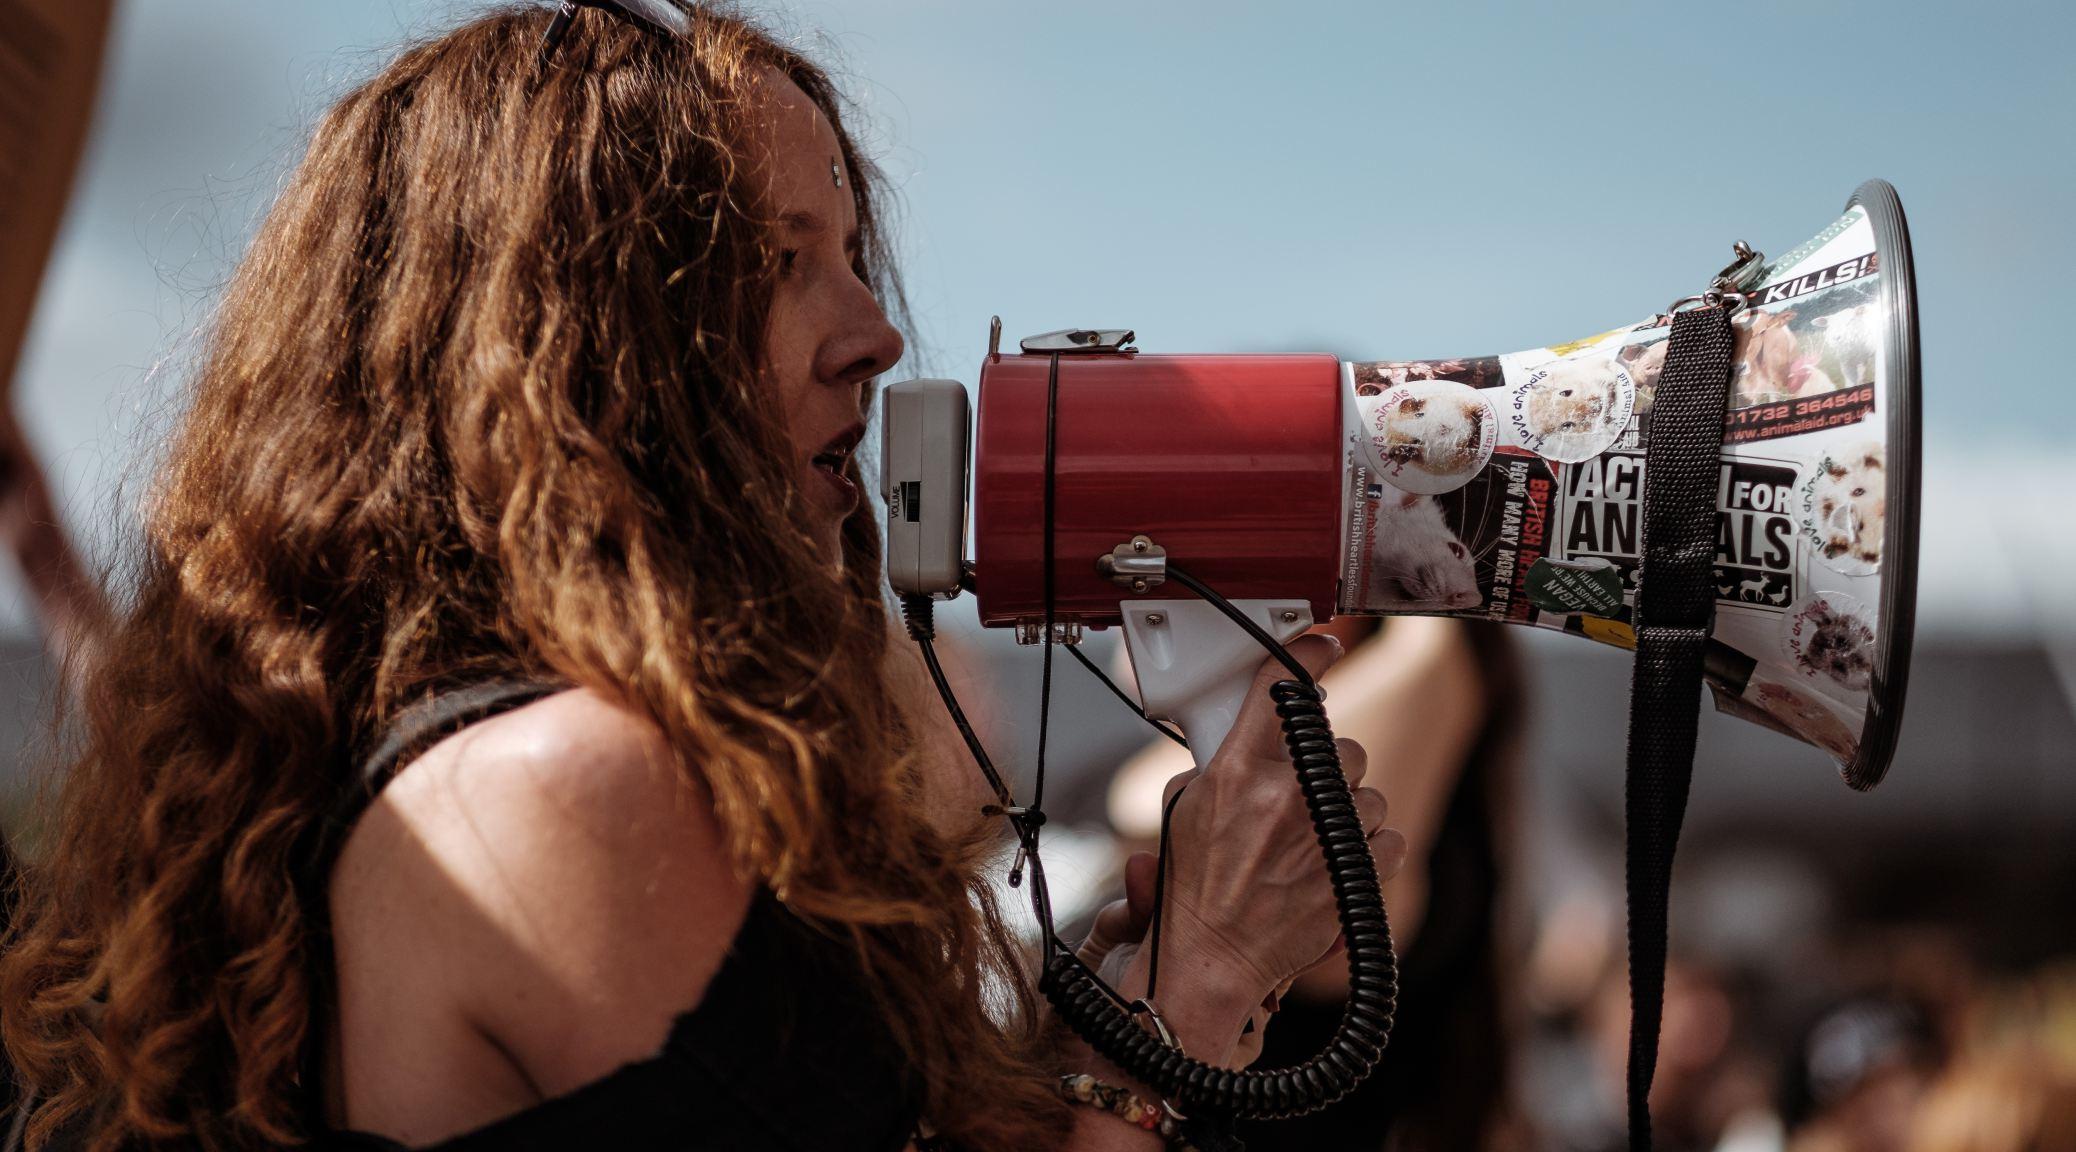 Woman holding bullhorn at demonstration.